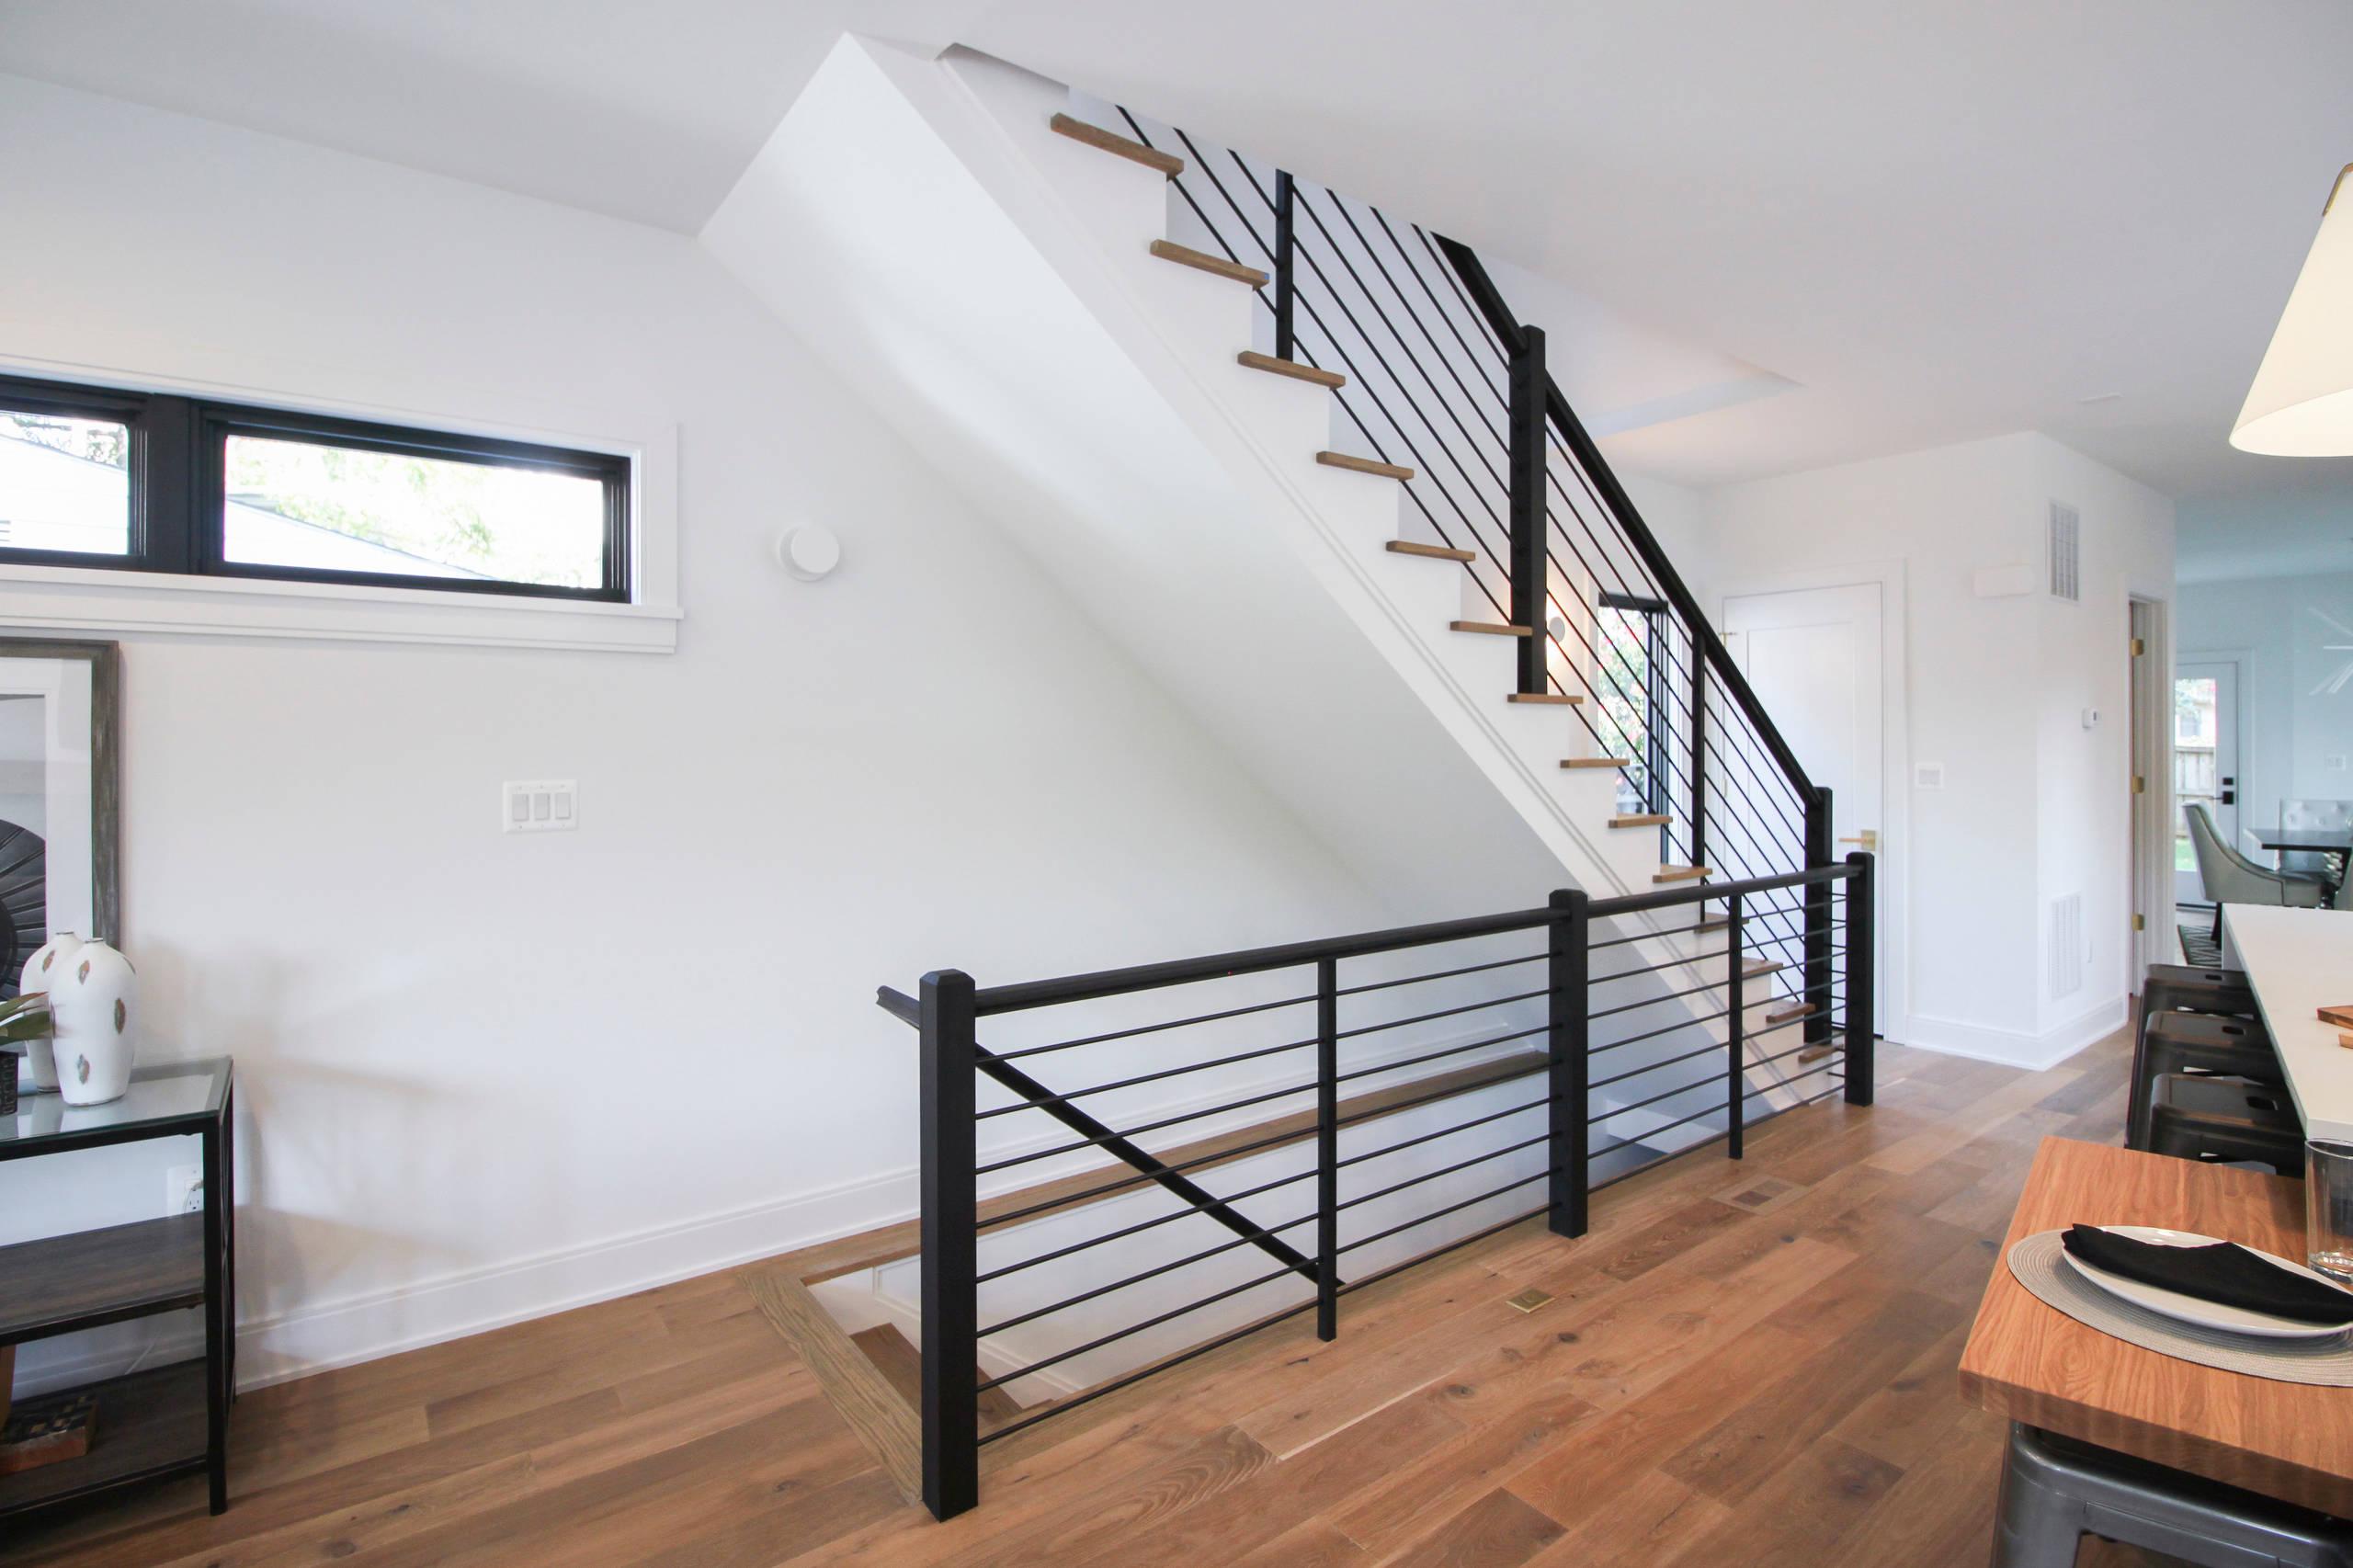 58 Creative Staircase For Timeless Home Arlington Va 22201 Modern Dc Metro By Century Stair Company Houzz